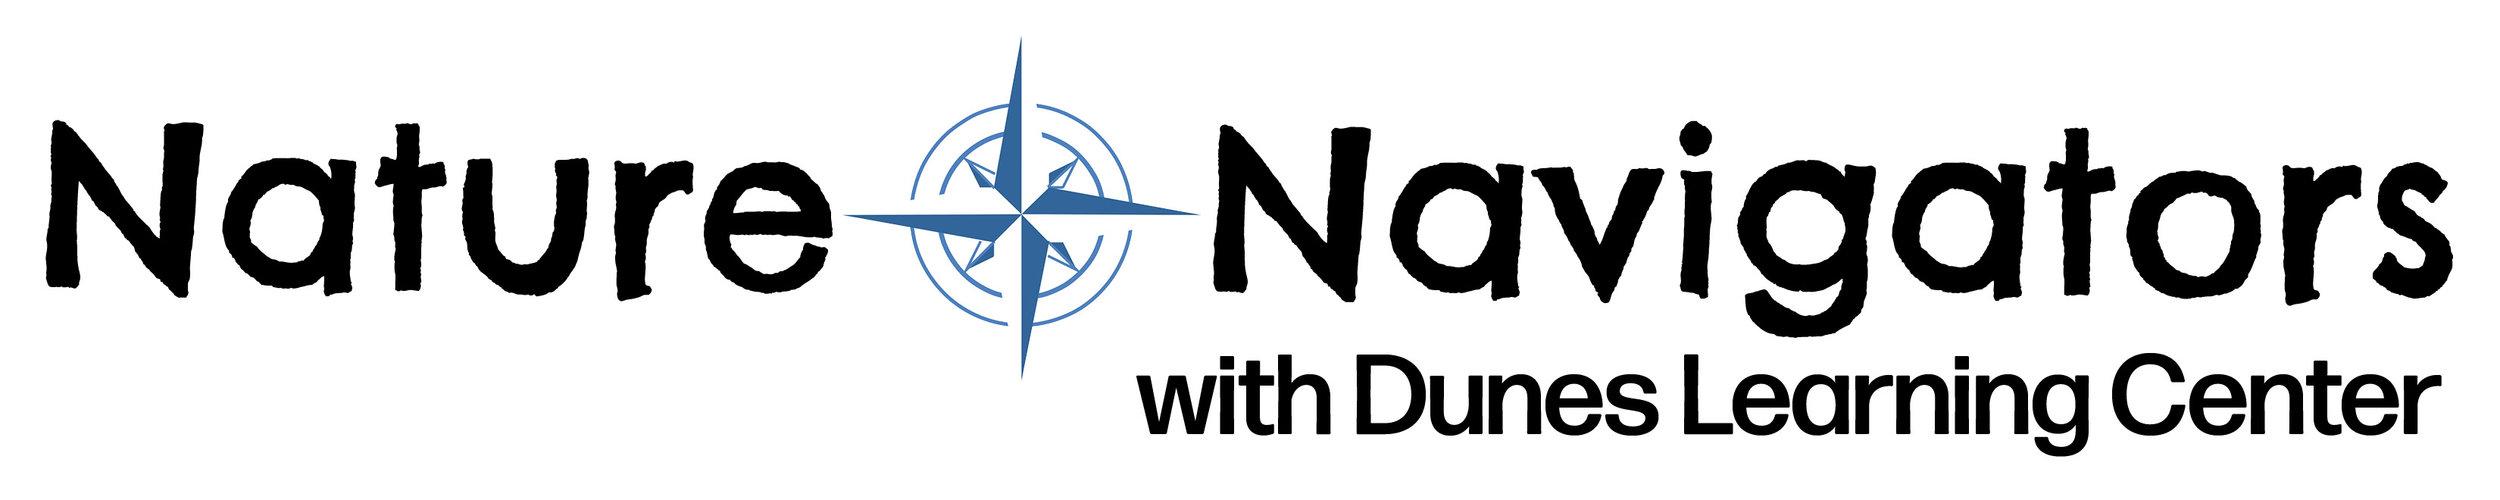 Nature Navigators logo.jpg